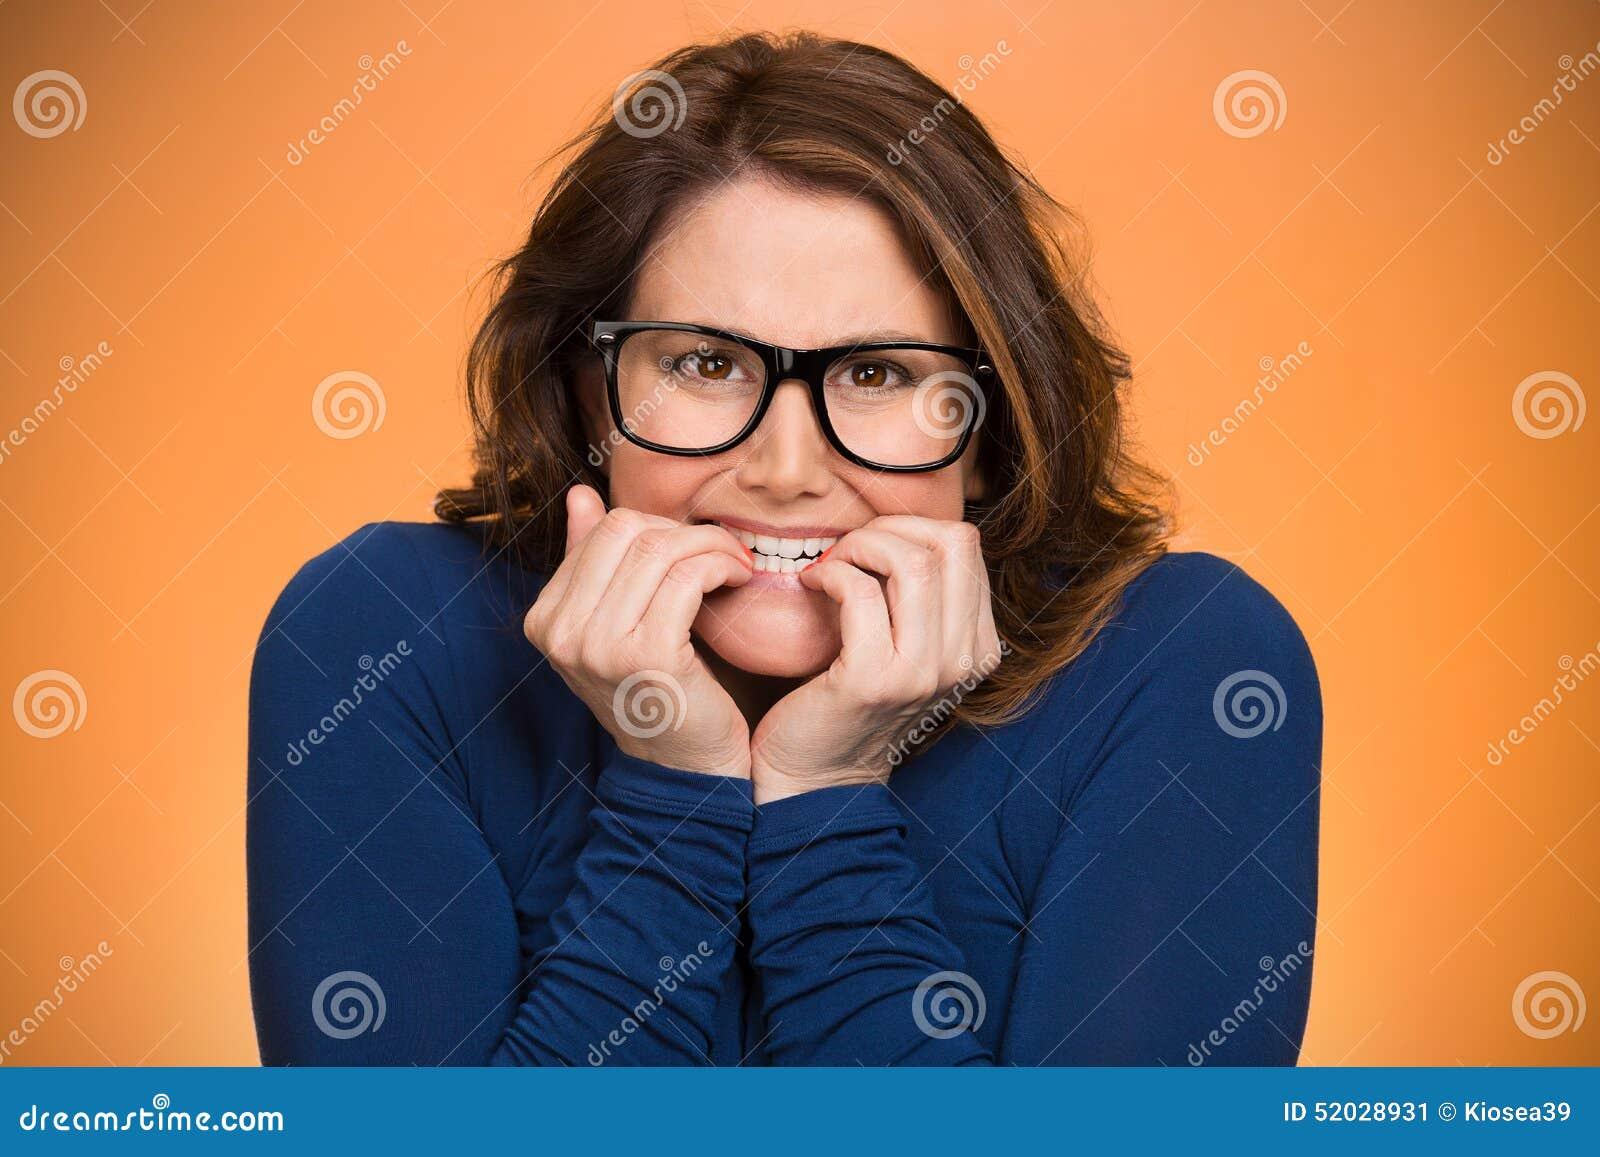 Mujer insegura ansiosa imagen de archivo. Imagen de loco - 52028931